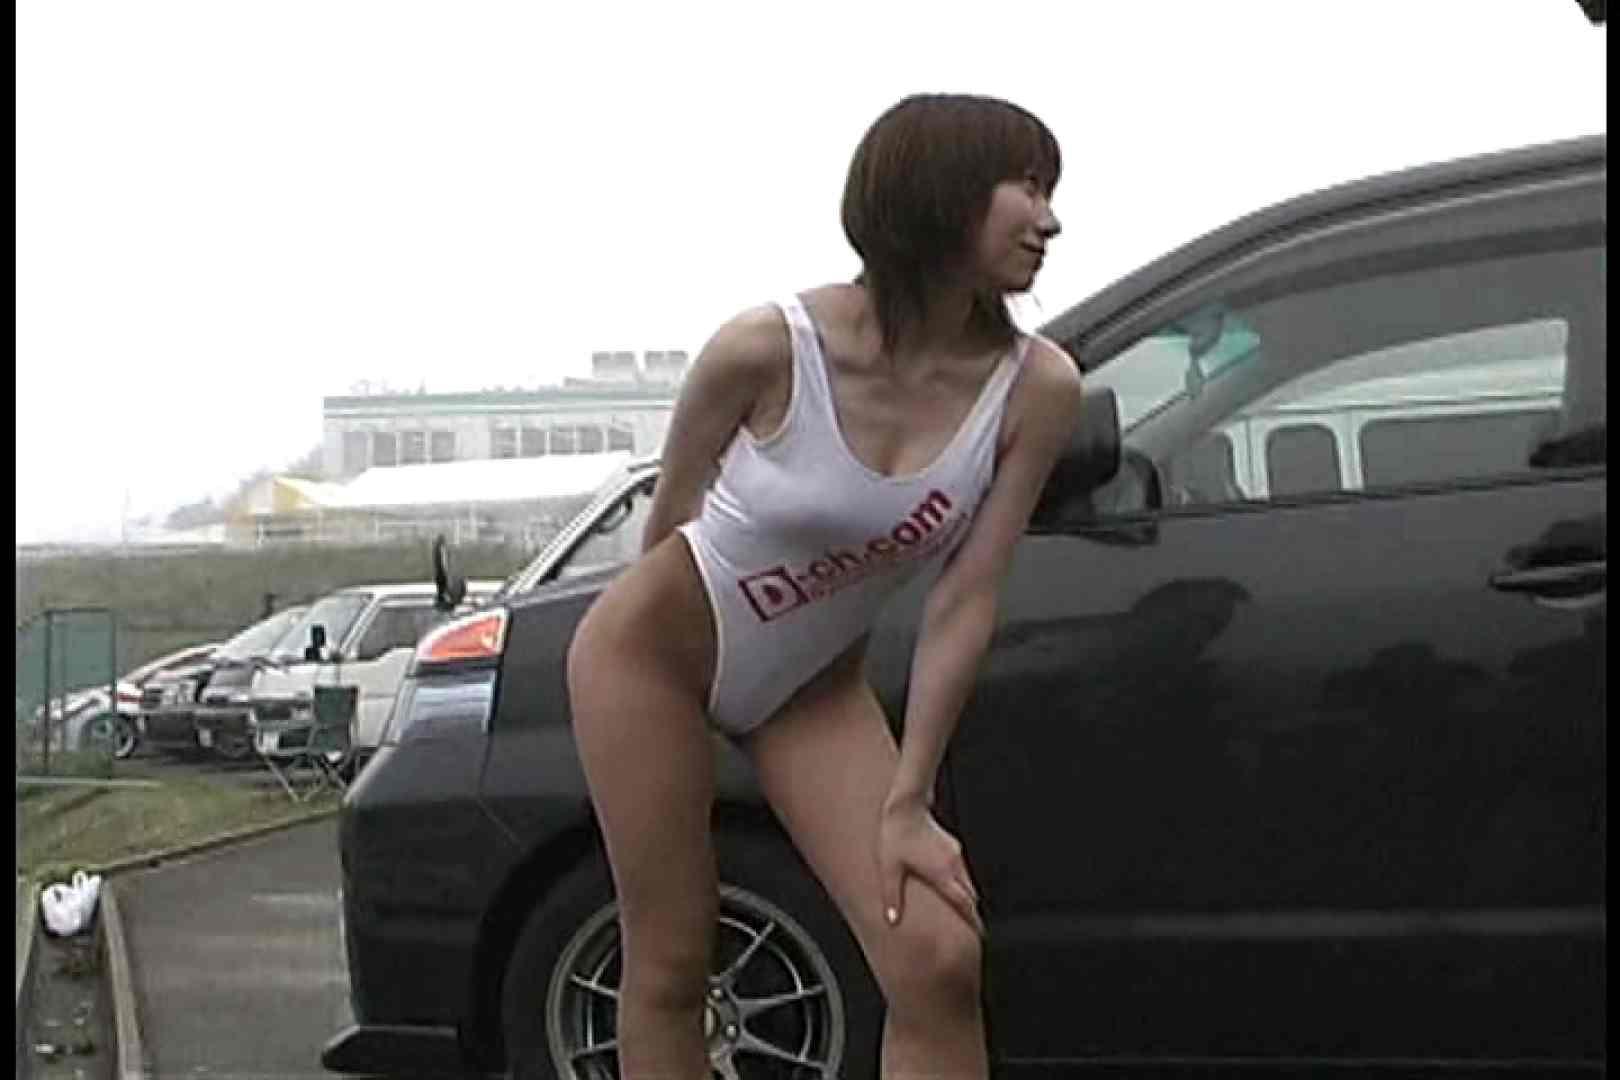 RQカメラ地獄Vol.3 美女OL   レースクイーン  83連発 53